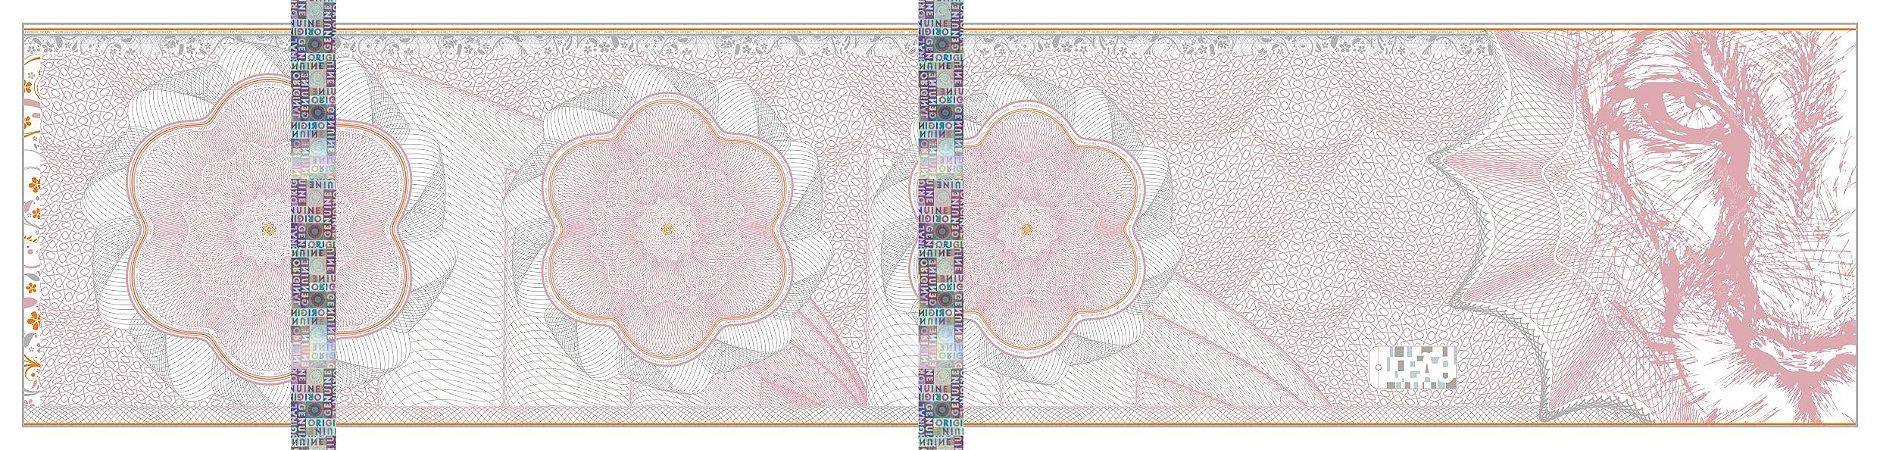 -Ingresso 3C Holografico Rosa